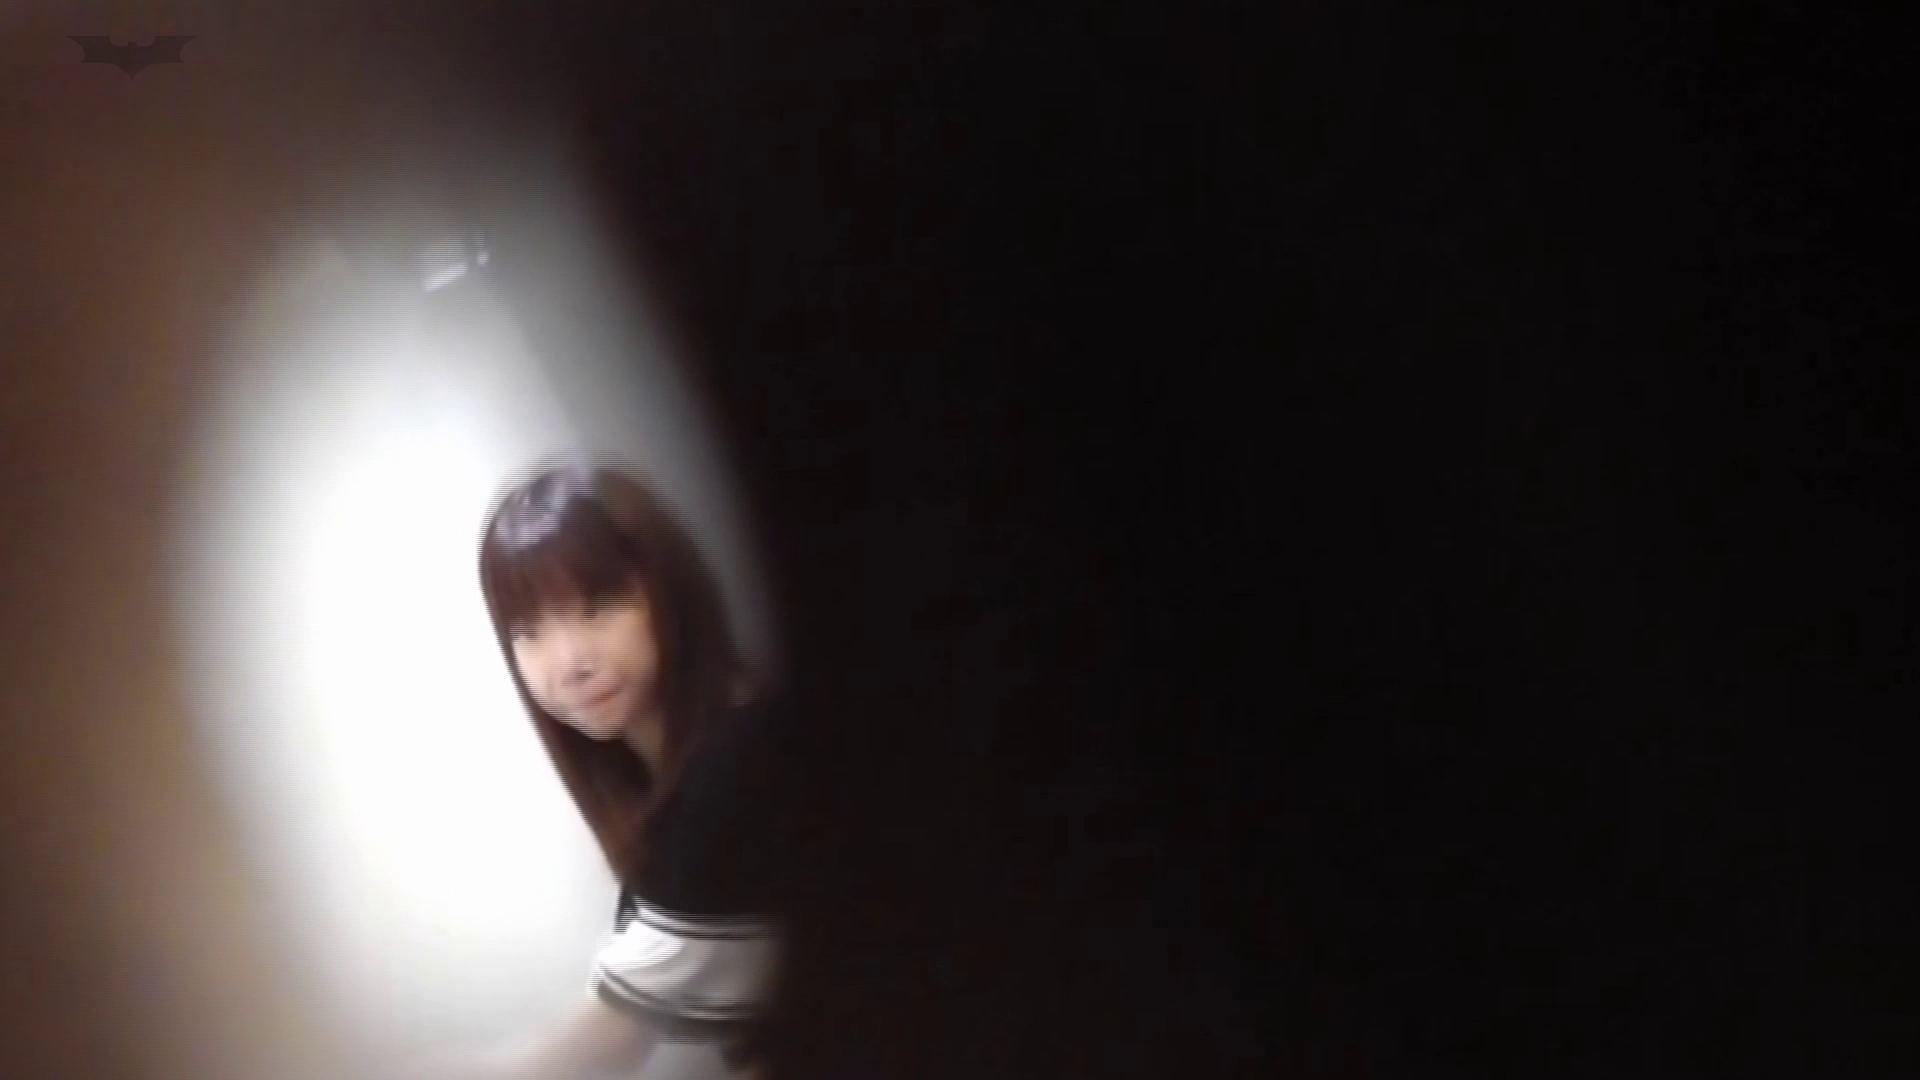 和式洋式七変化 Vol.32 綺麗な子連続登場 丸見え オメコ無修正動画無料 93枚 65